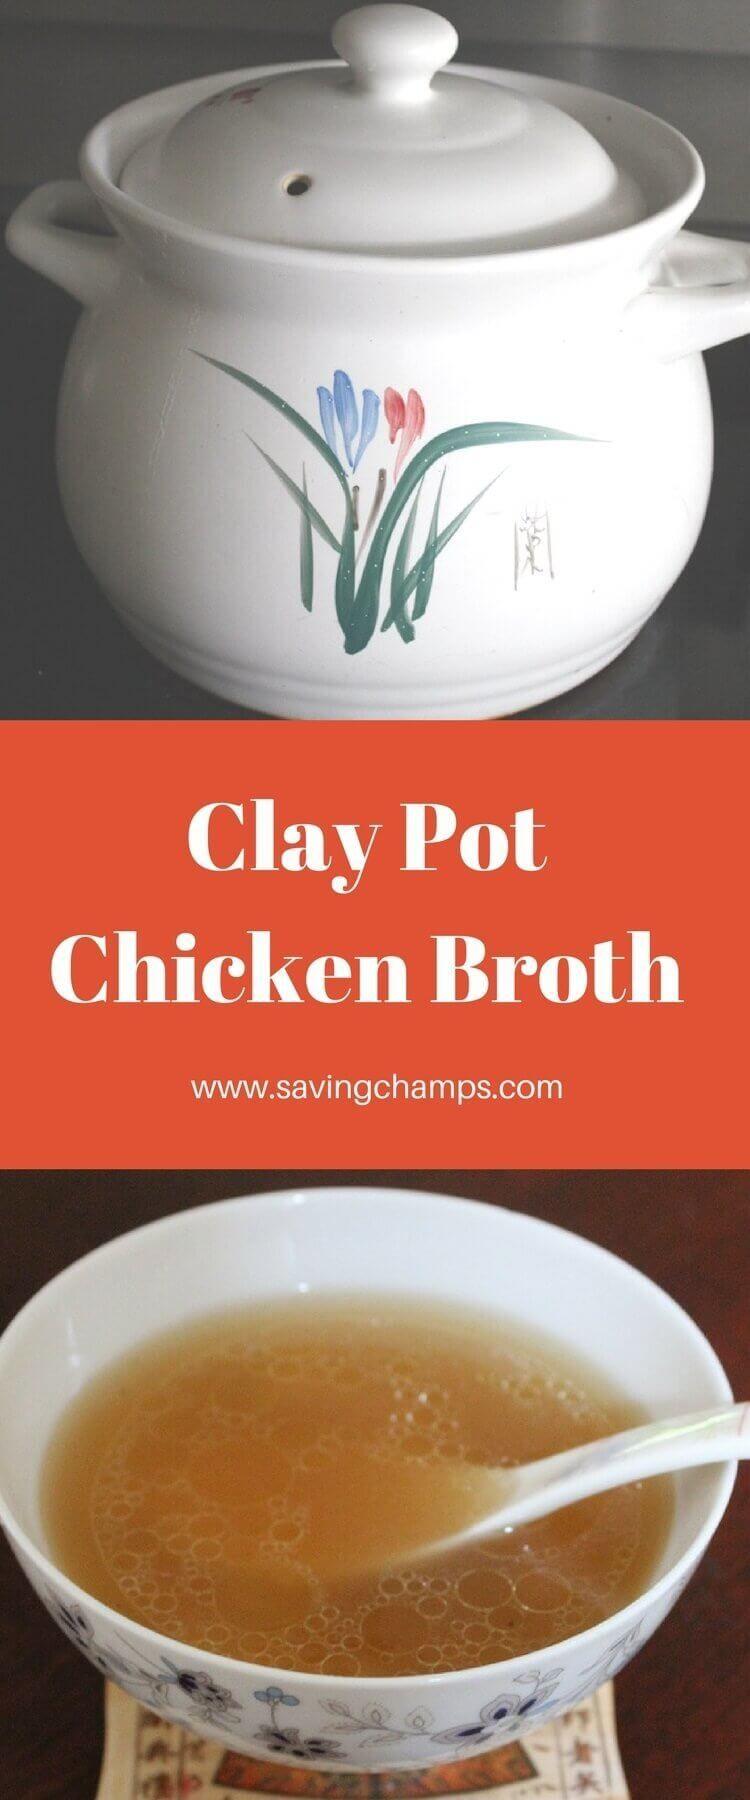 Clay Pot Chicken Broth Clay pot chicken recipe, Chicken